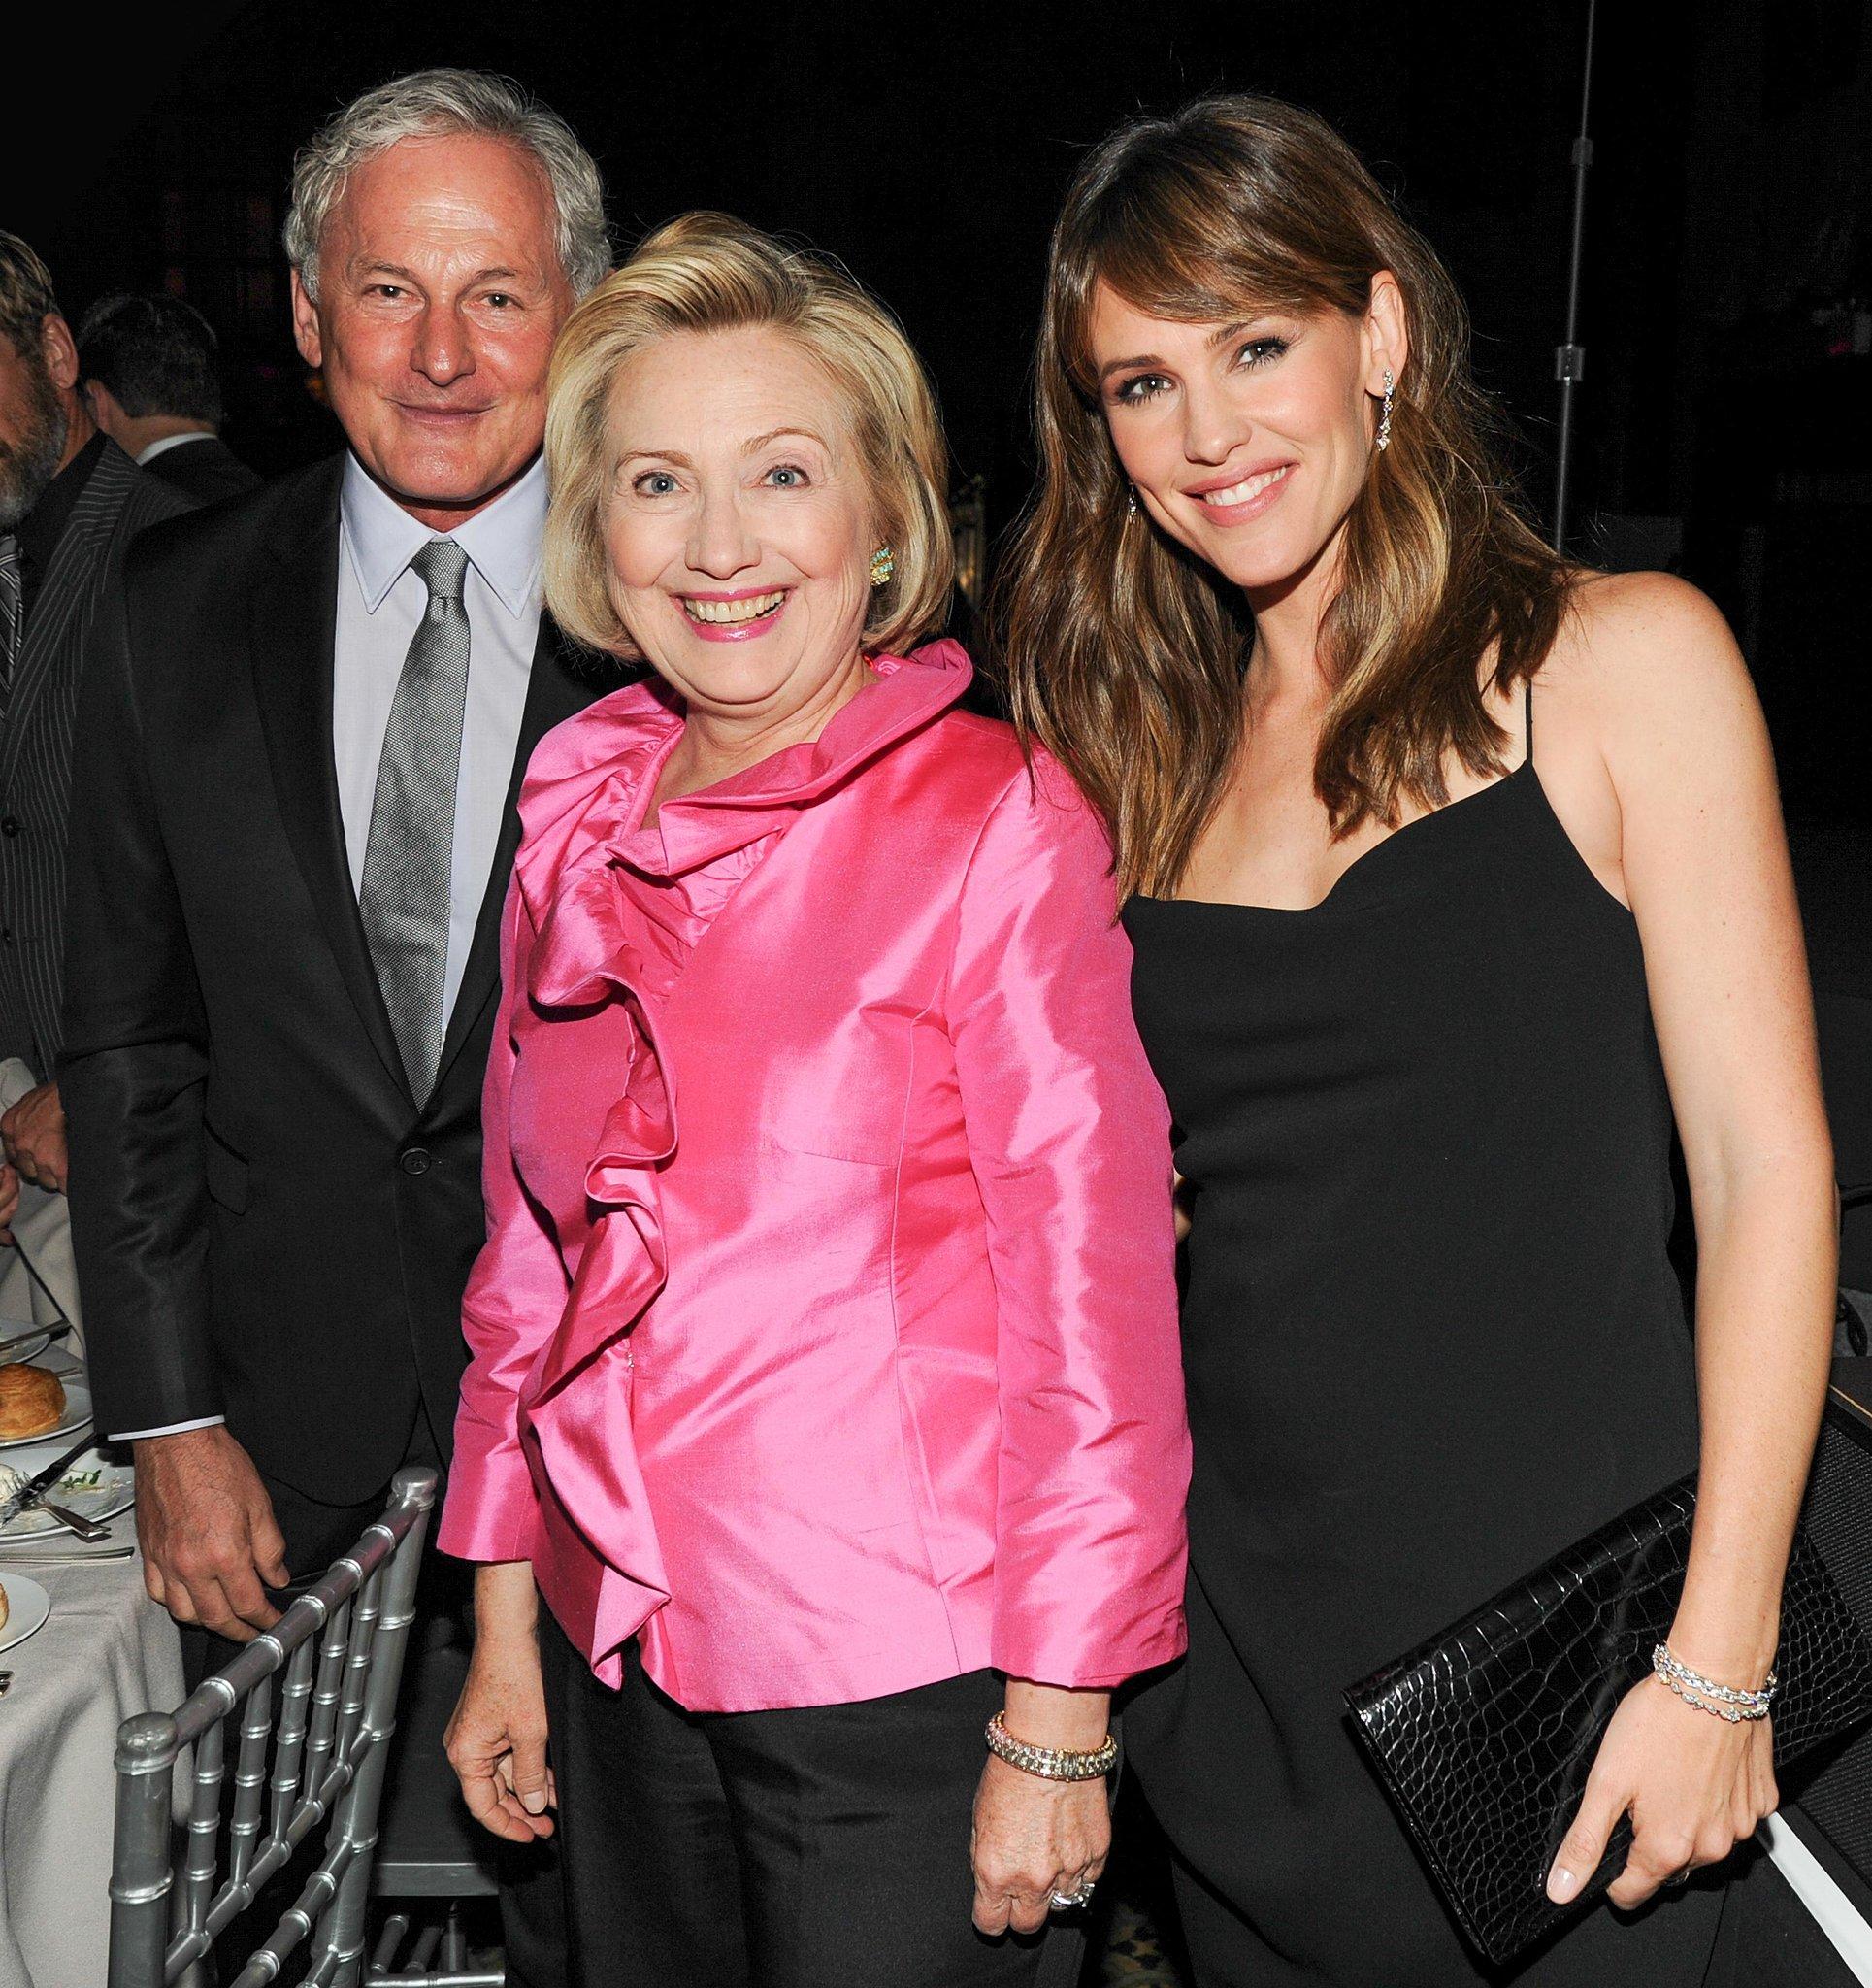 Hillary Clinton, Jennifer Garner, and Victor Garber posed for pictures together.